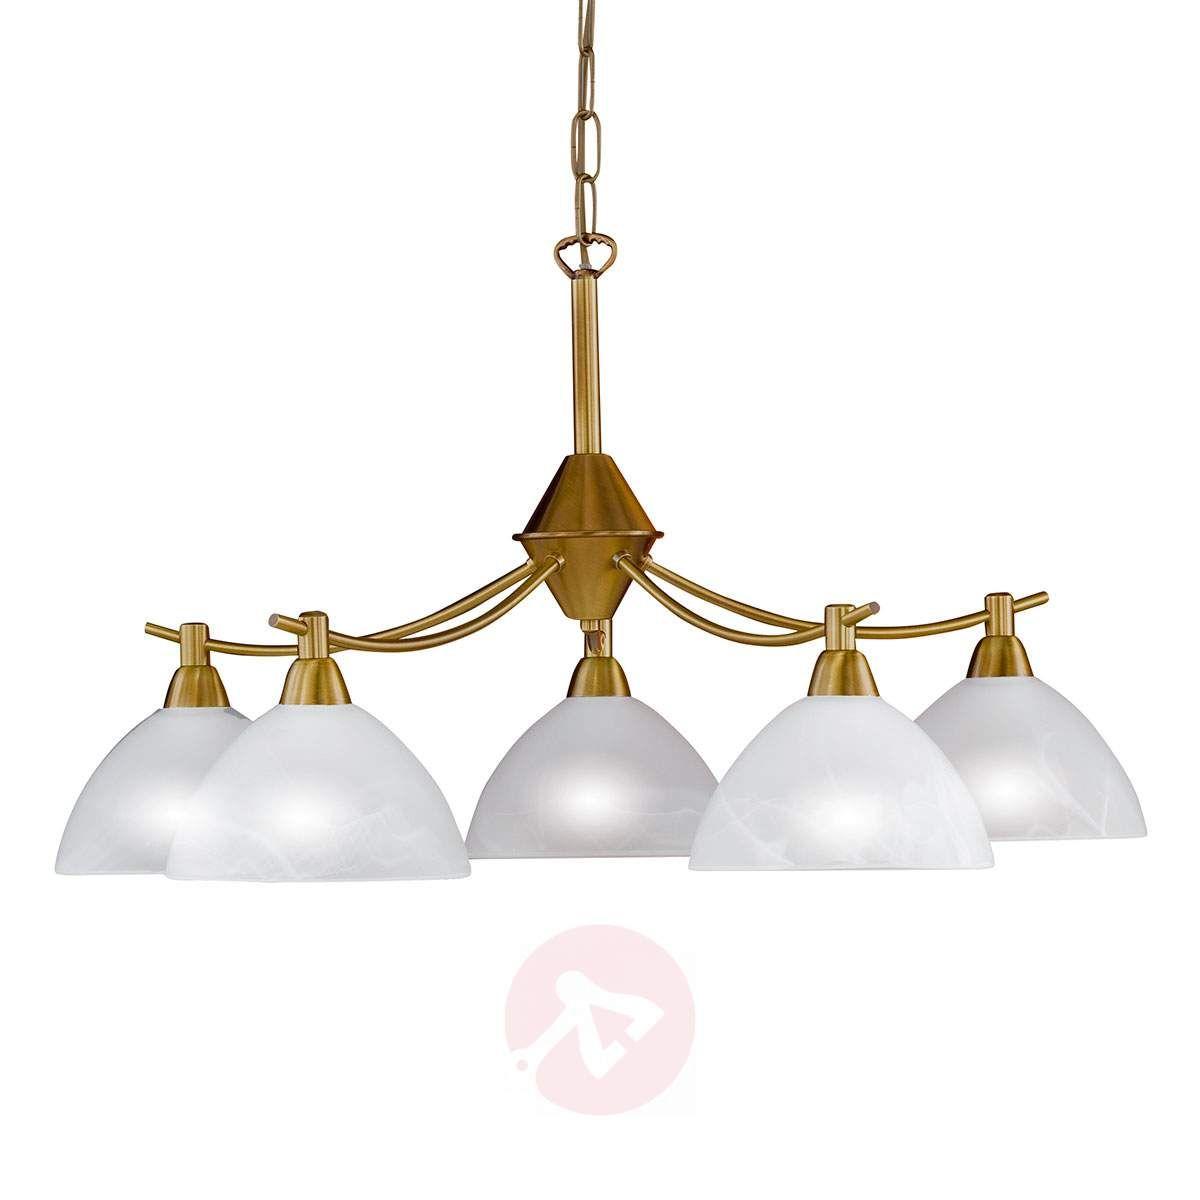 5 Punktowa Oryginalna Lampa Wisząca Amsterdam W 2019 Lampy